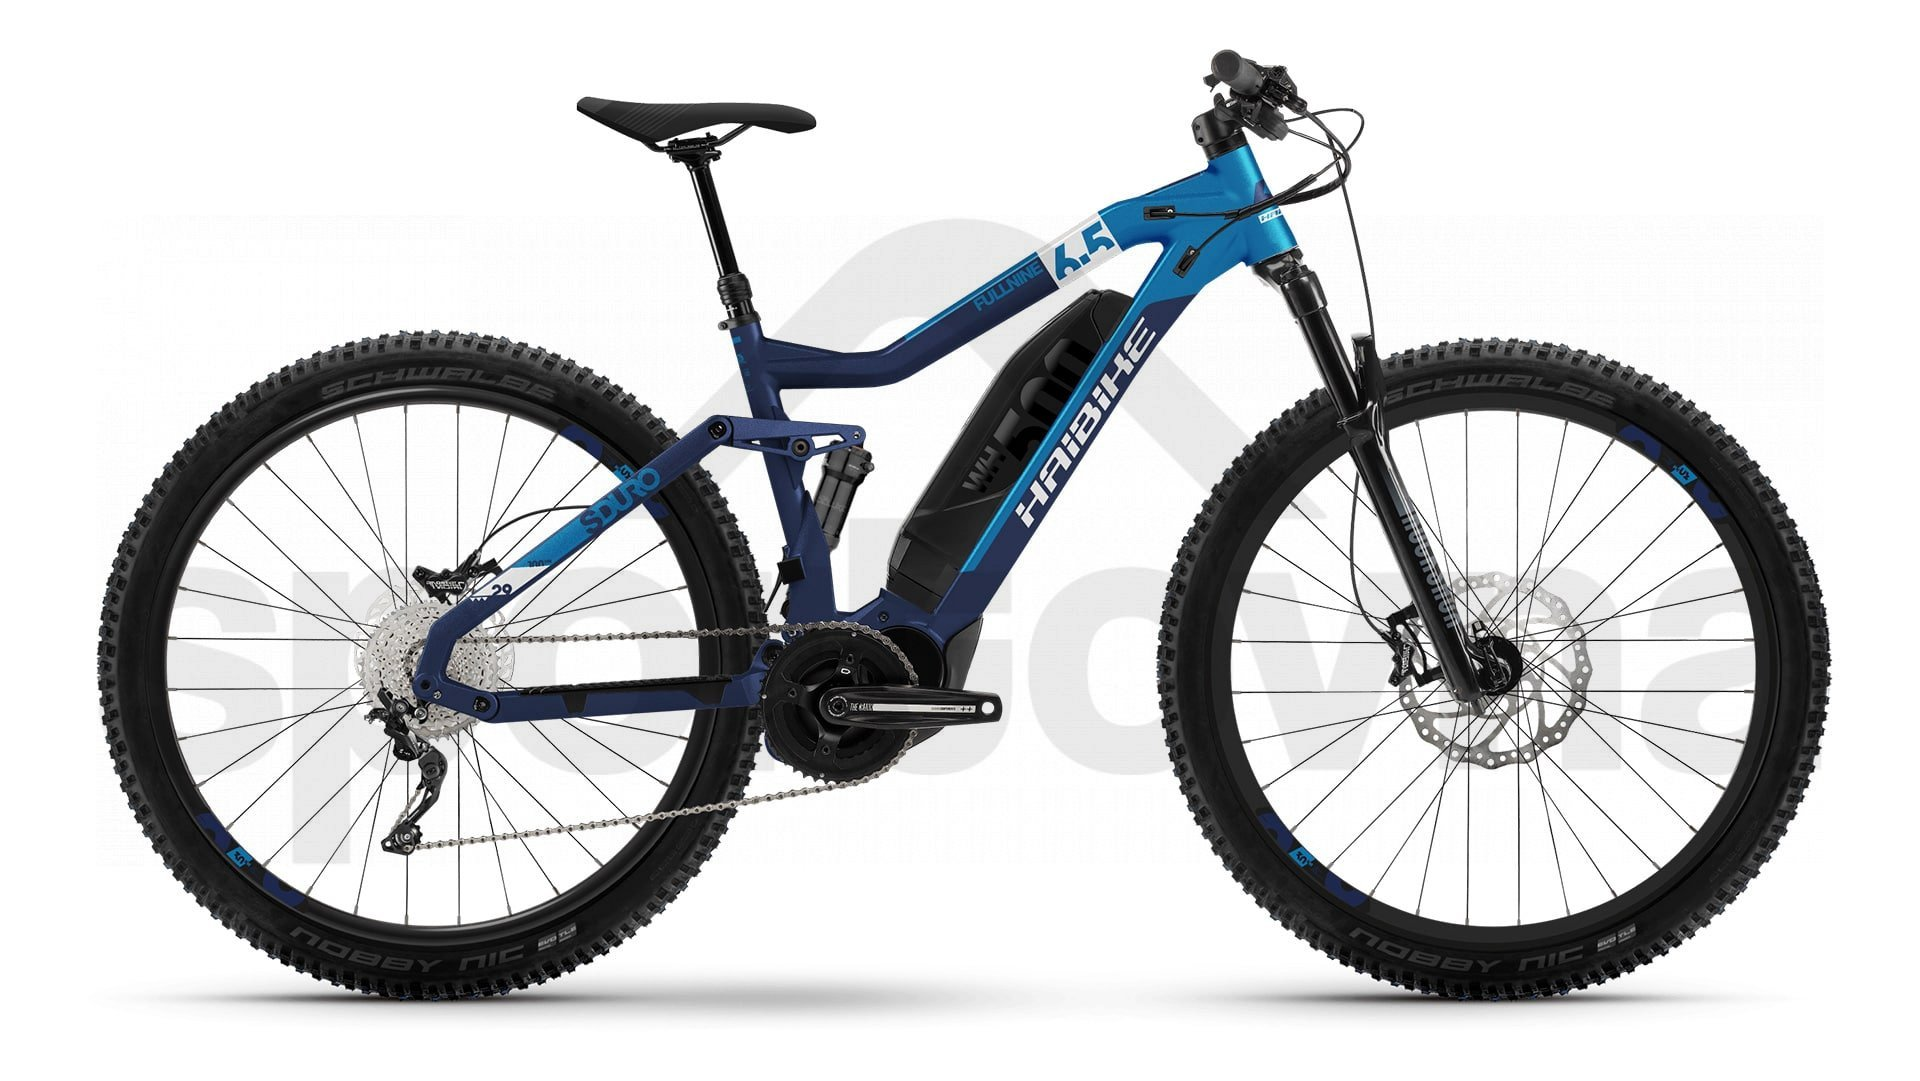 haibike-fullnine-6-5-elektro-fahrrad-2021-01